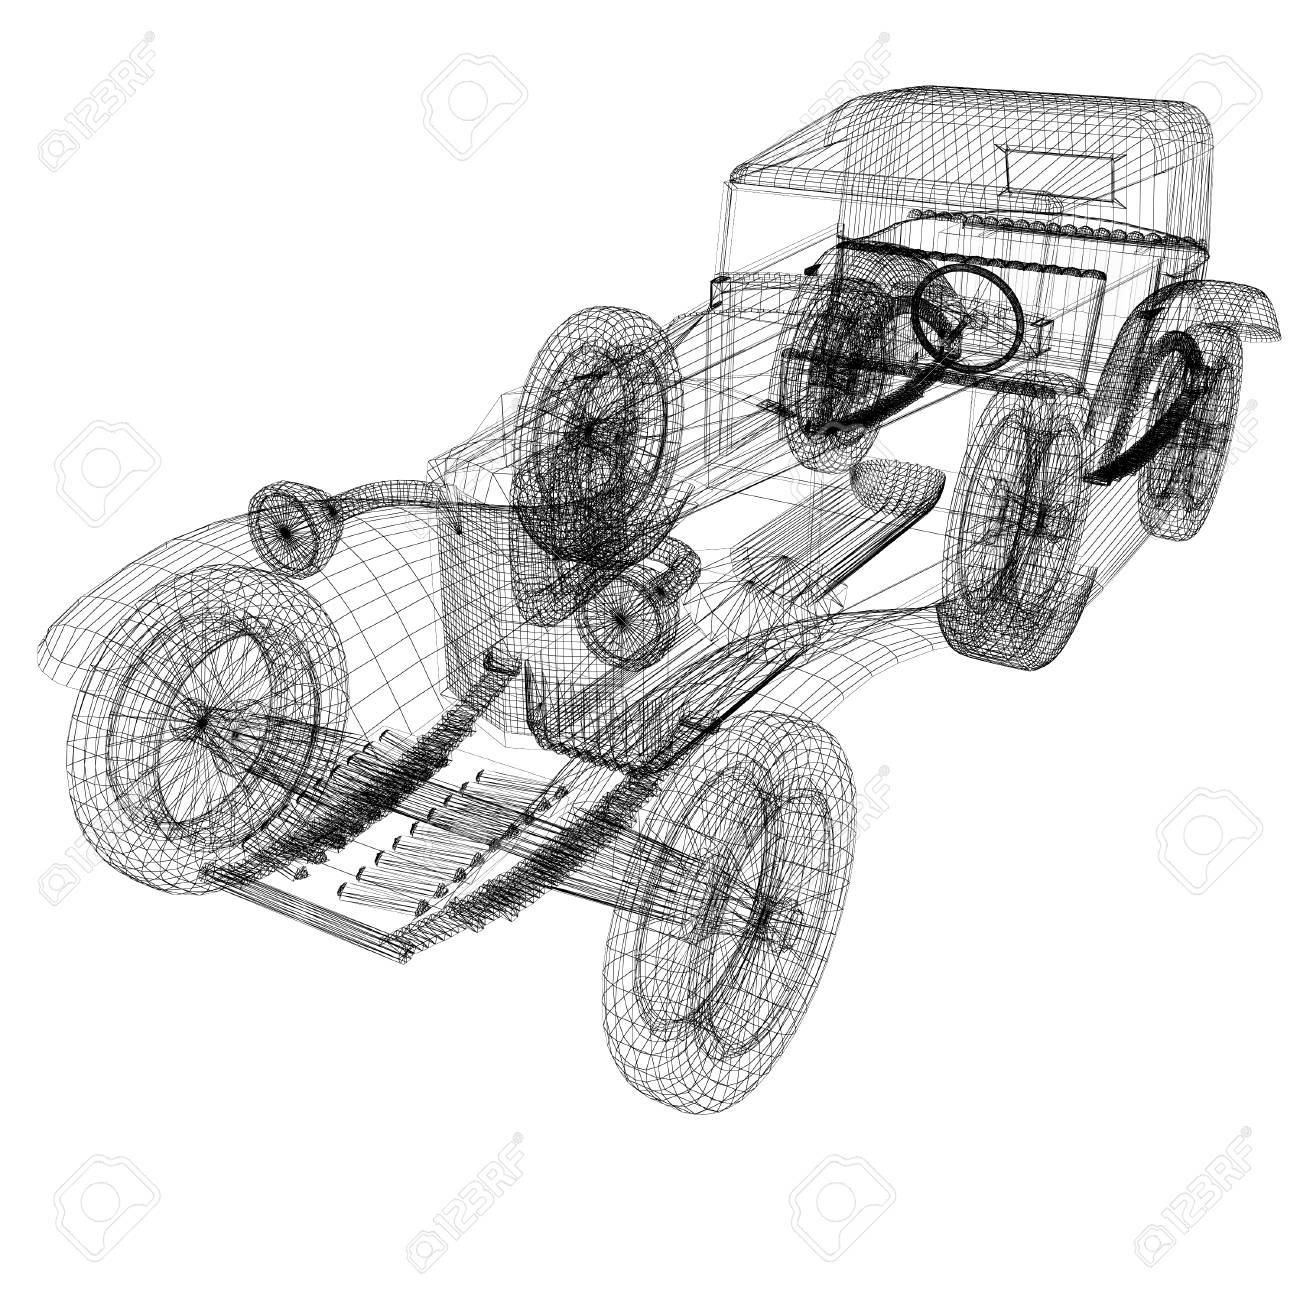 3d model retro car stock photo - 45815759